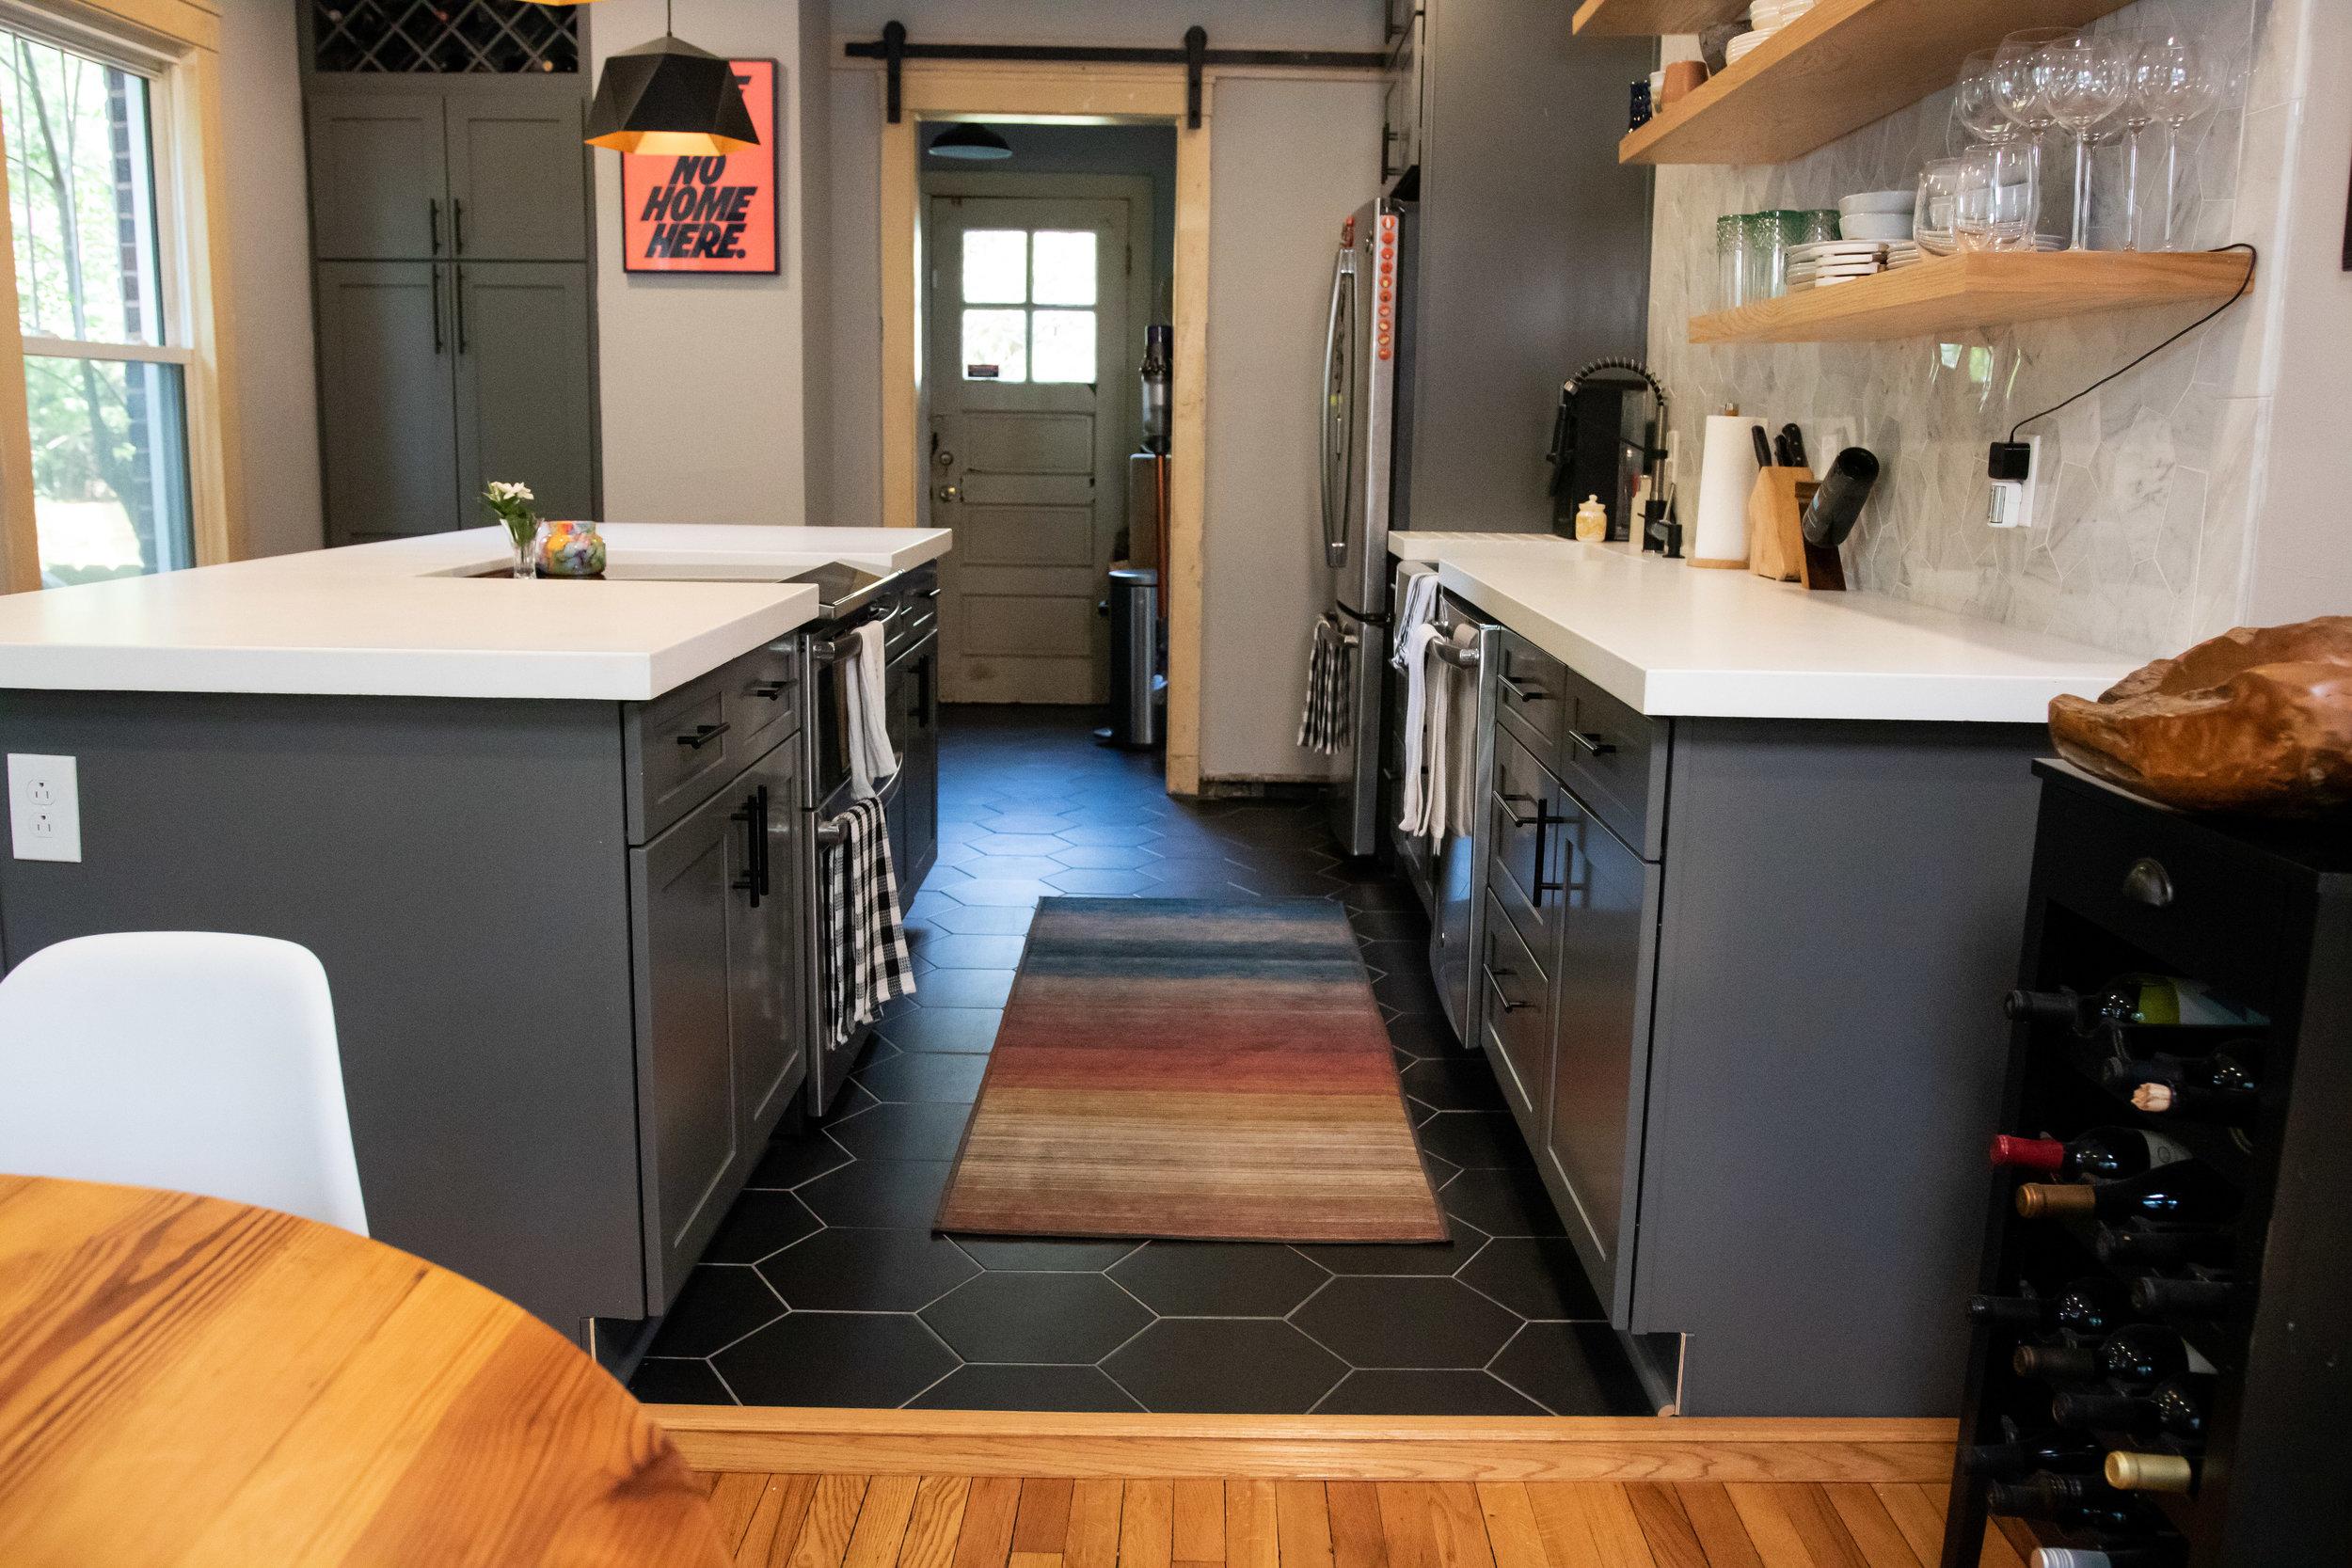 5300-countertop-kitchen-12.jpg